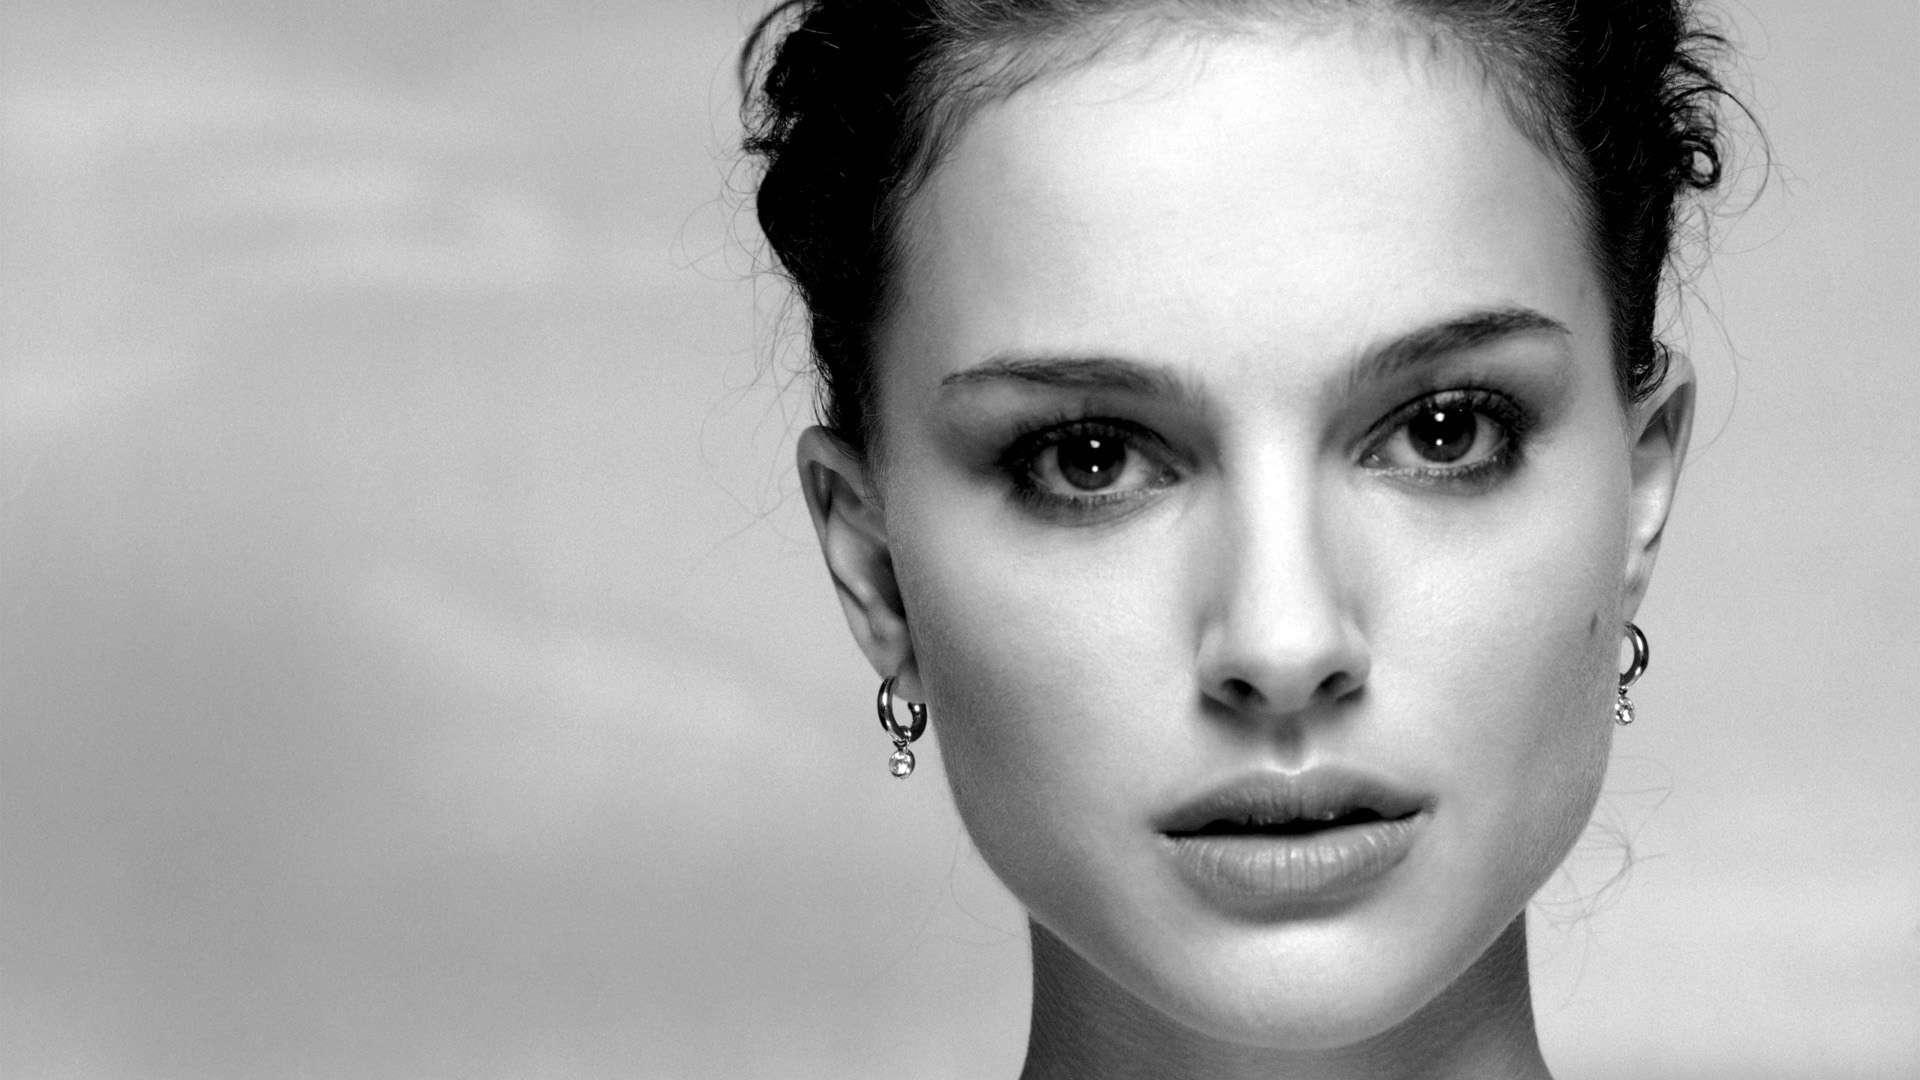 Natalie Portman Wallpapers Animation | vergapipe.